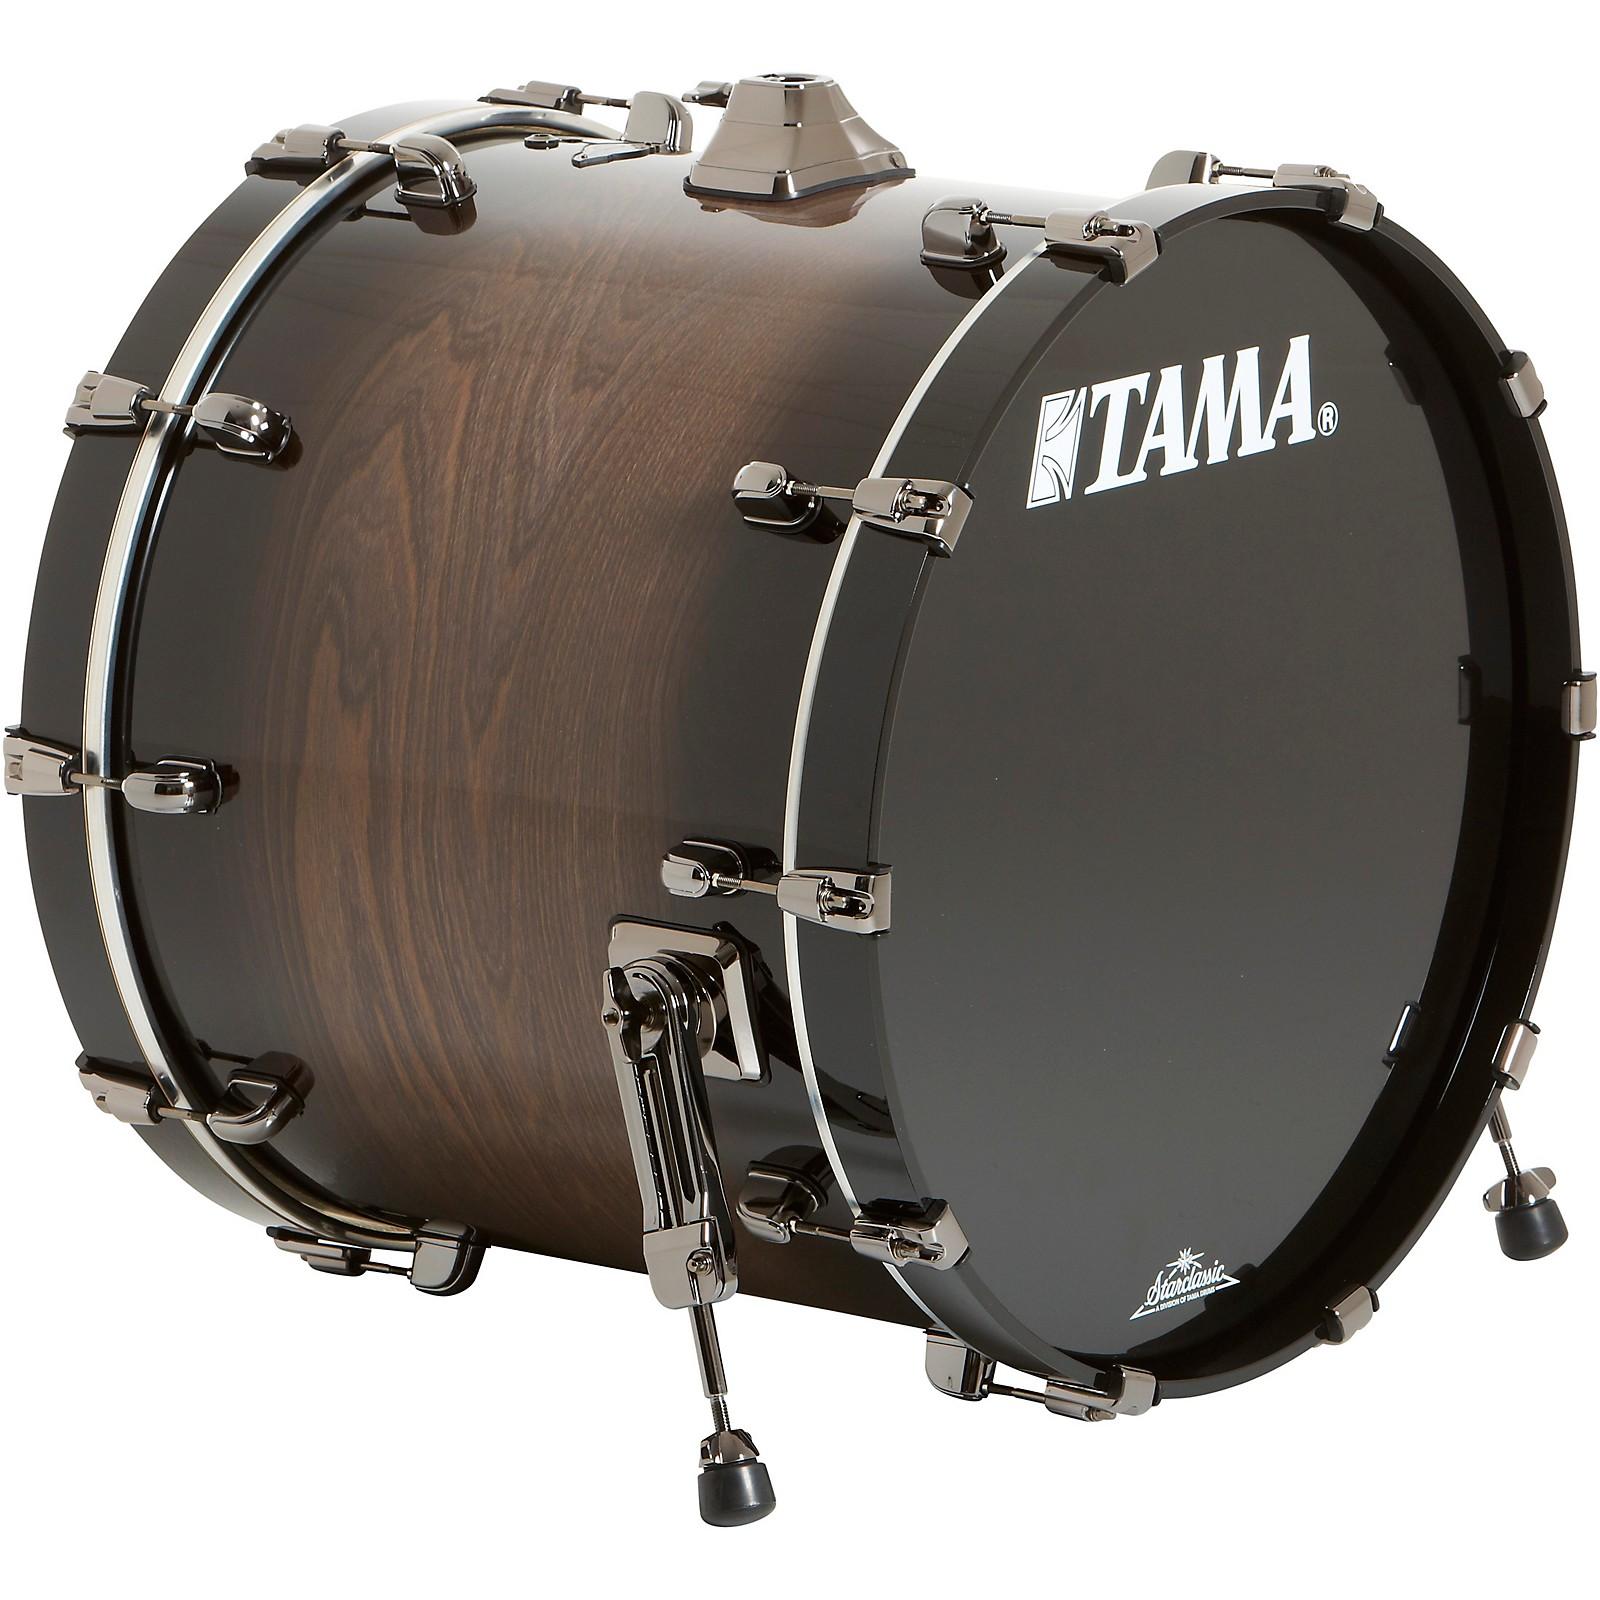 TAMA Starclassic Performer B/B Limited Edition Bass Drum